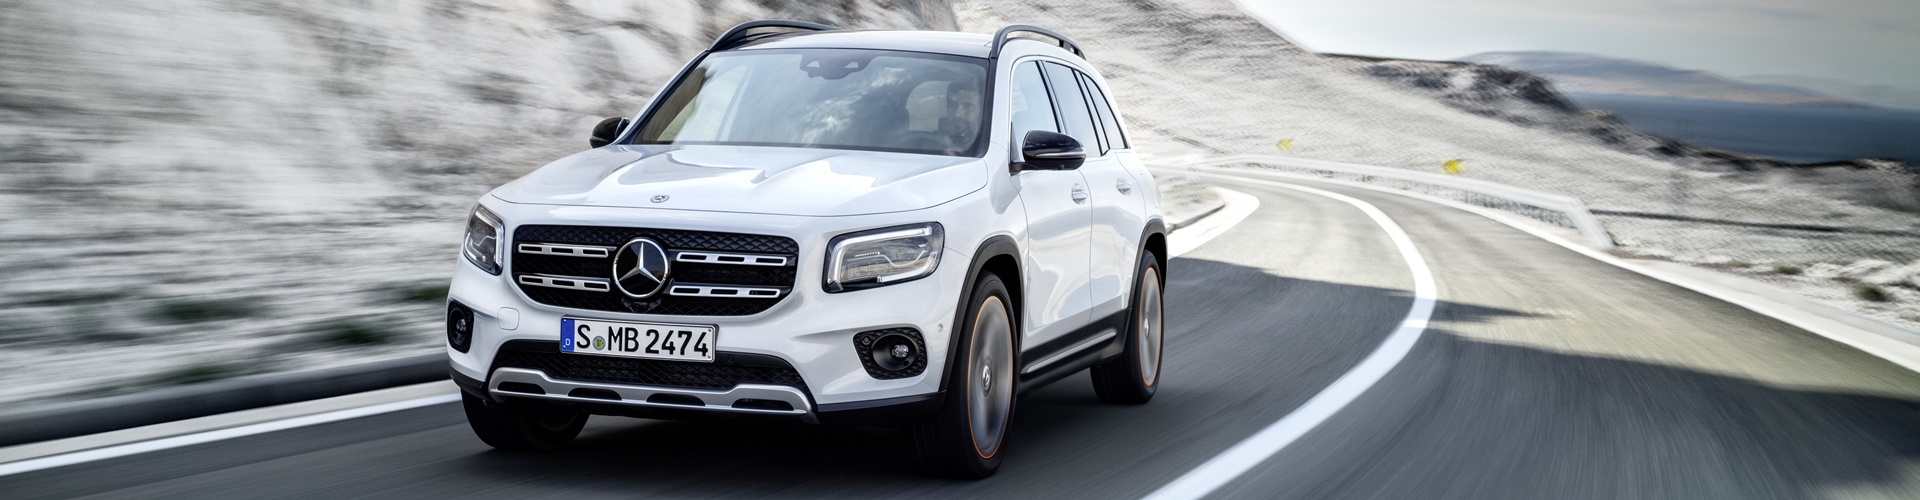 Auto Nagel: Mercedes-Benz GLA in voller Fahrt